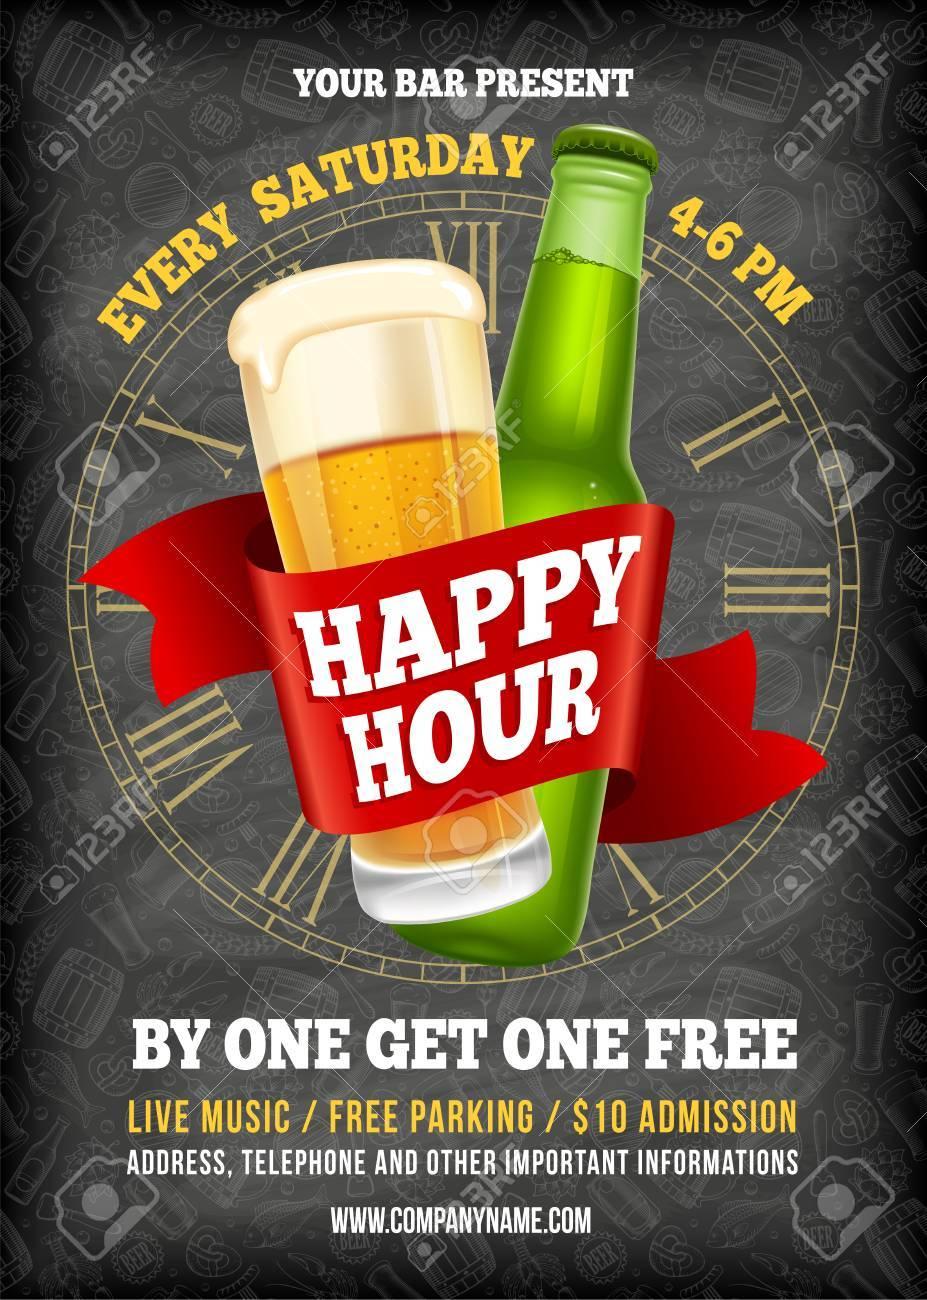 Happy Hour Free Beer Vintage Illustration Template For Web